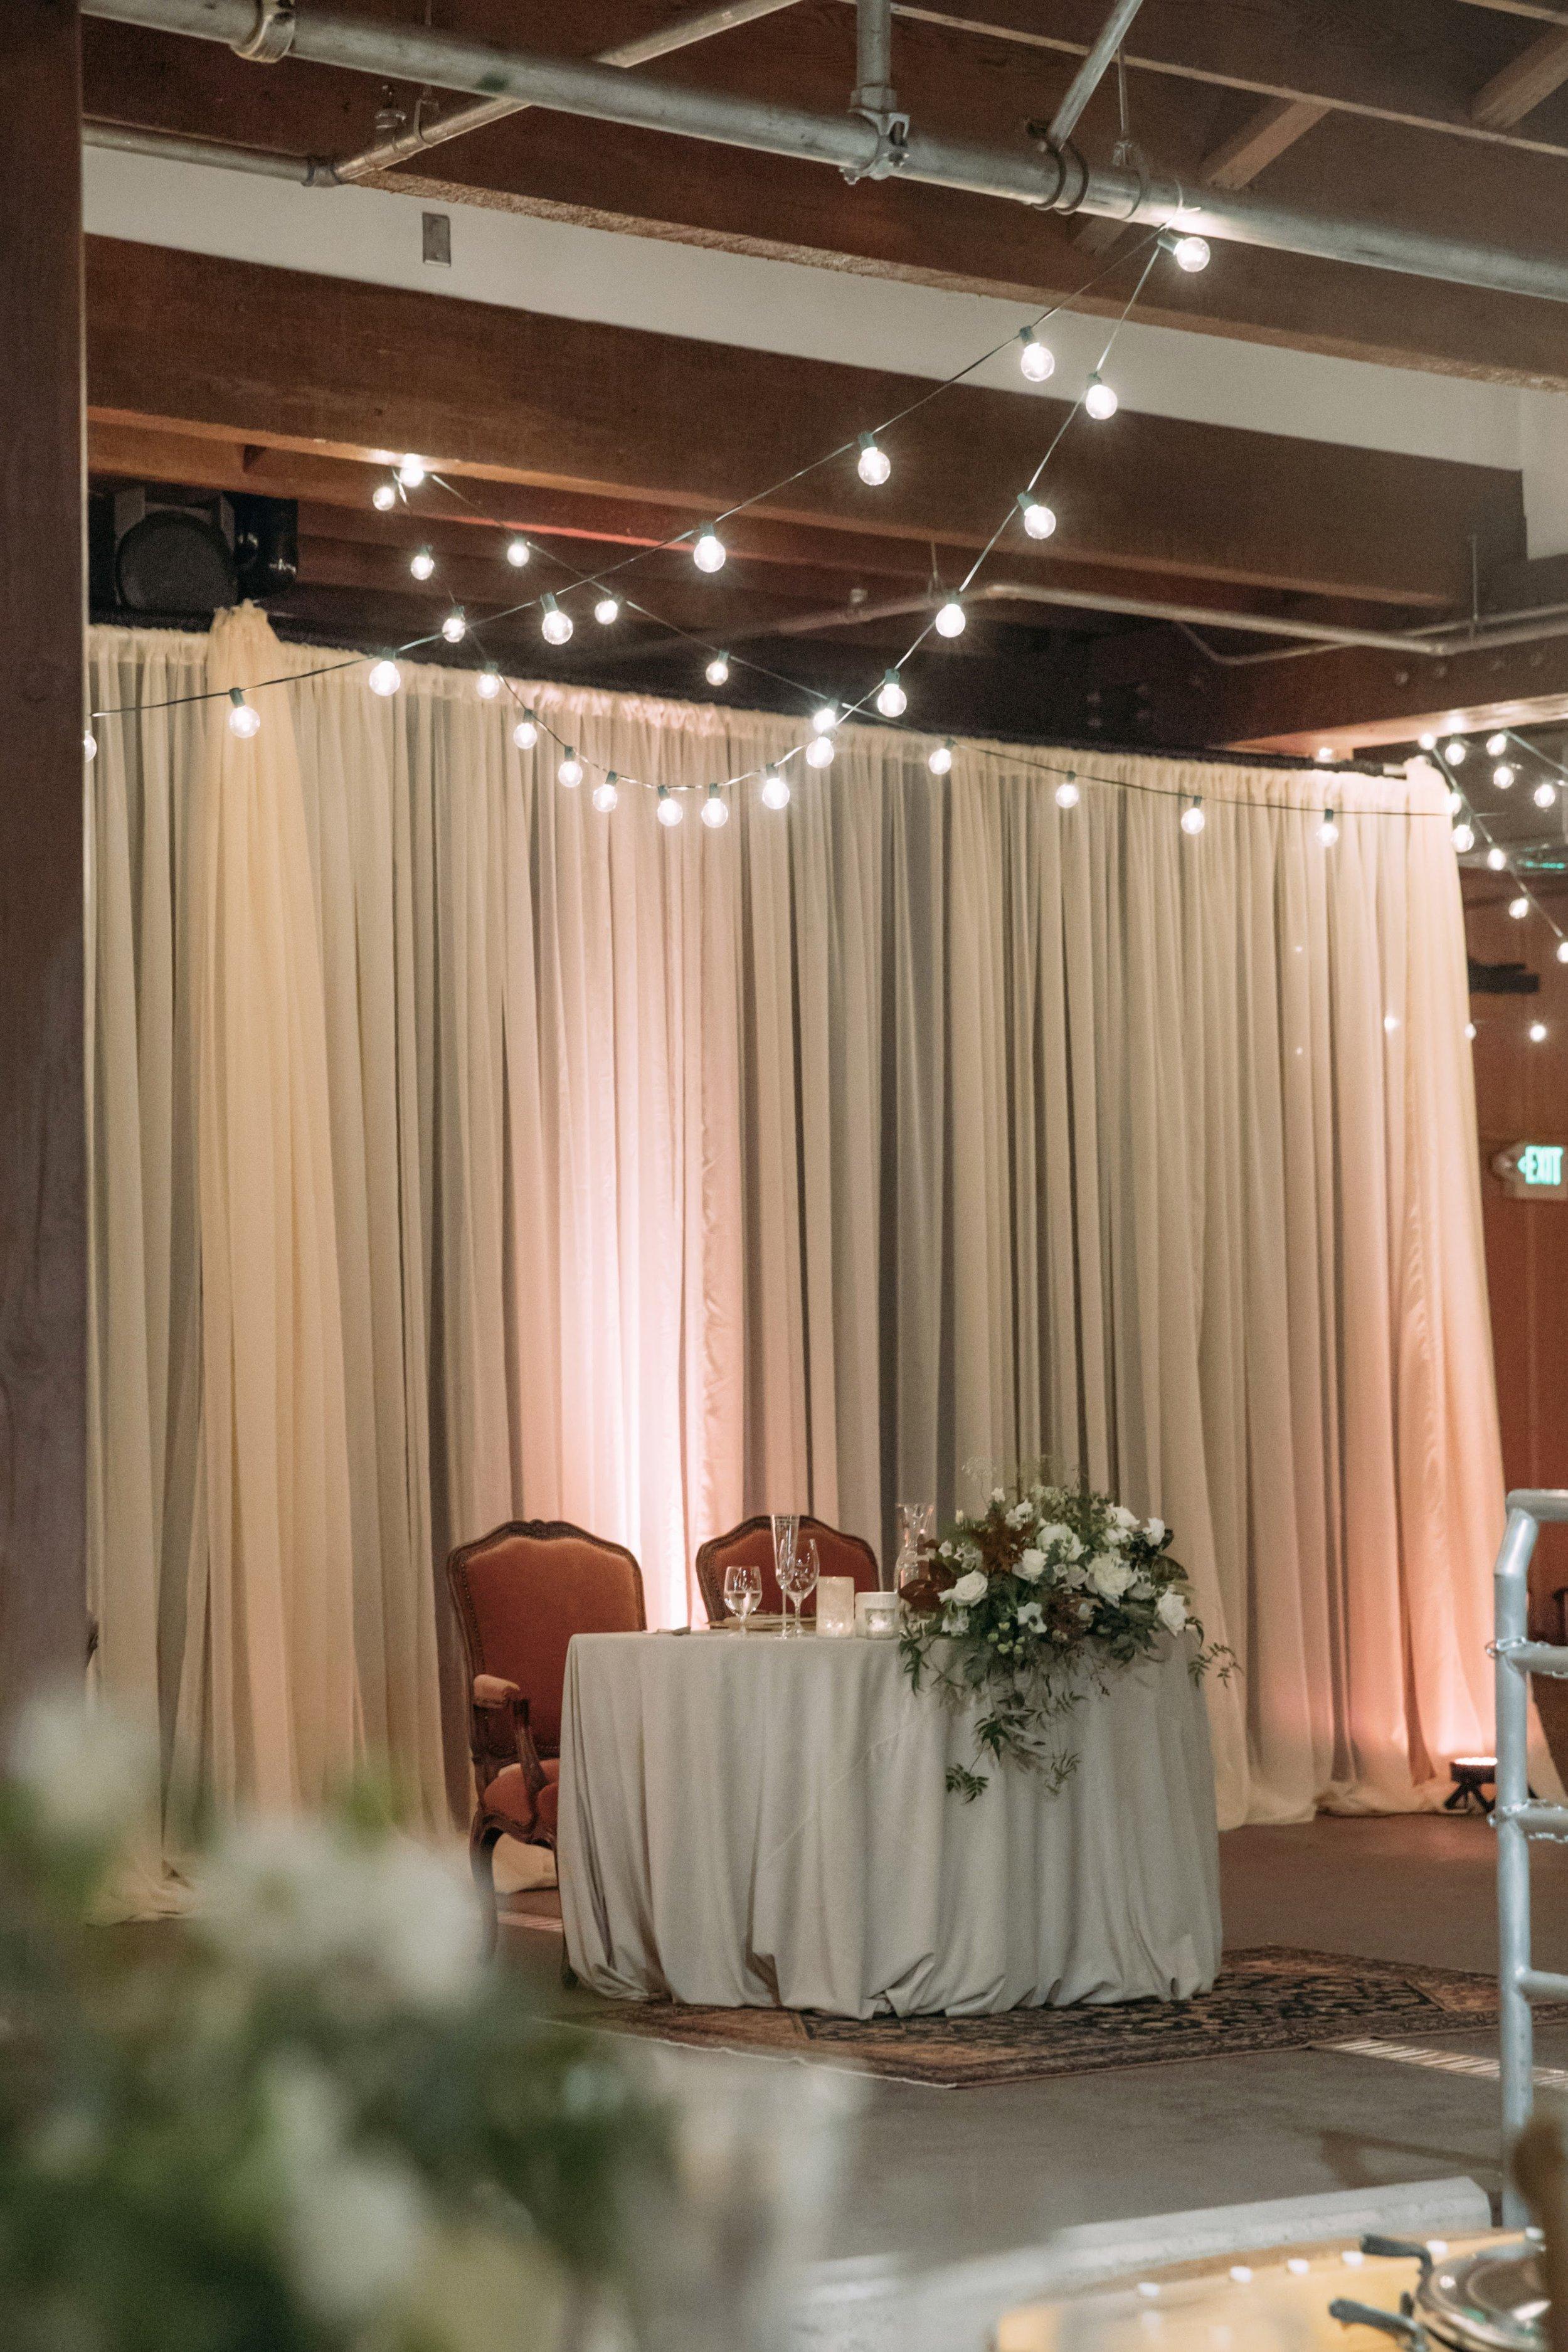 Portland_wedding_planner_walla_walla_07.jpg